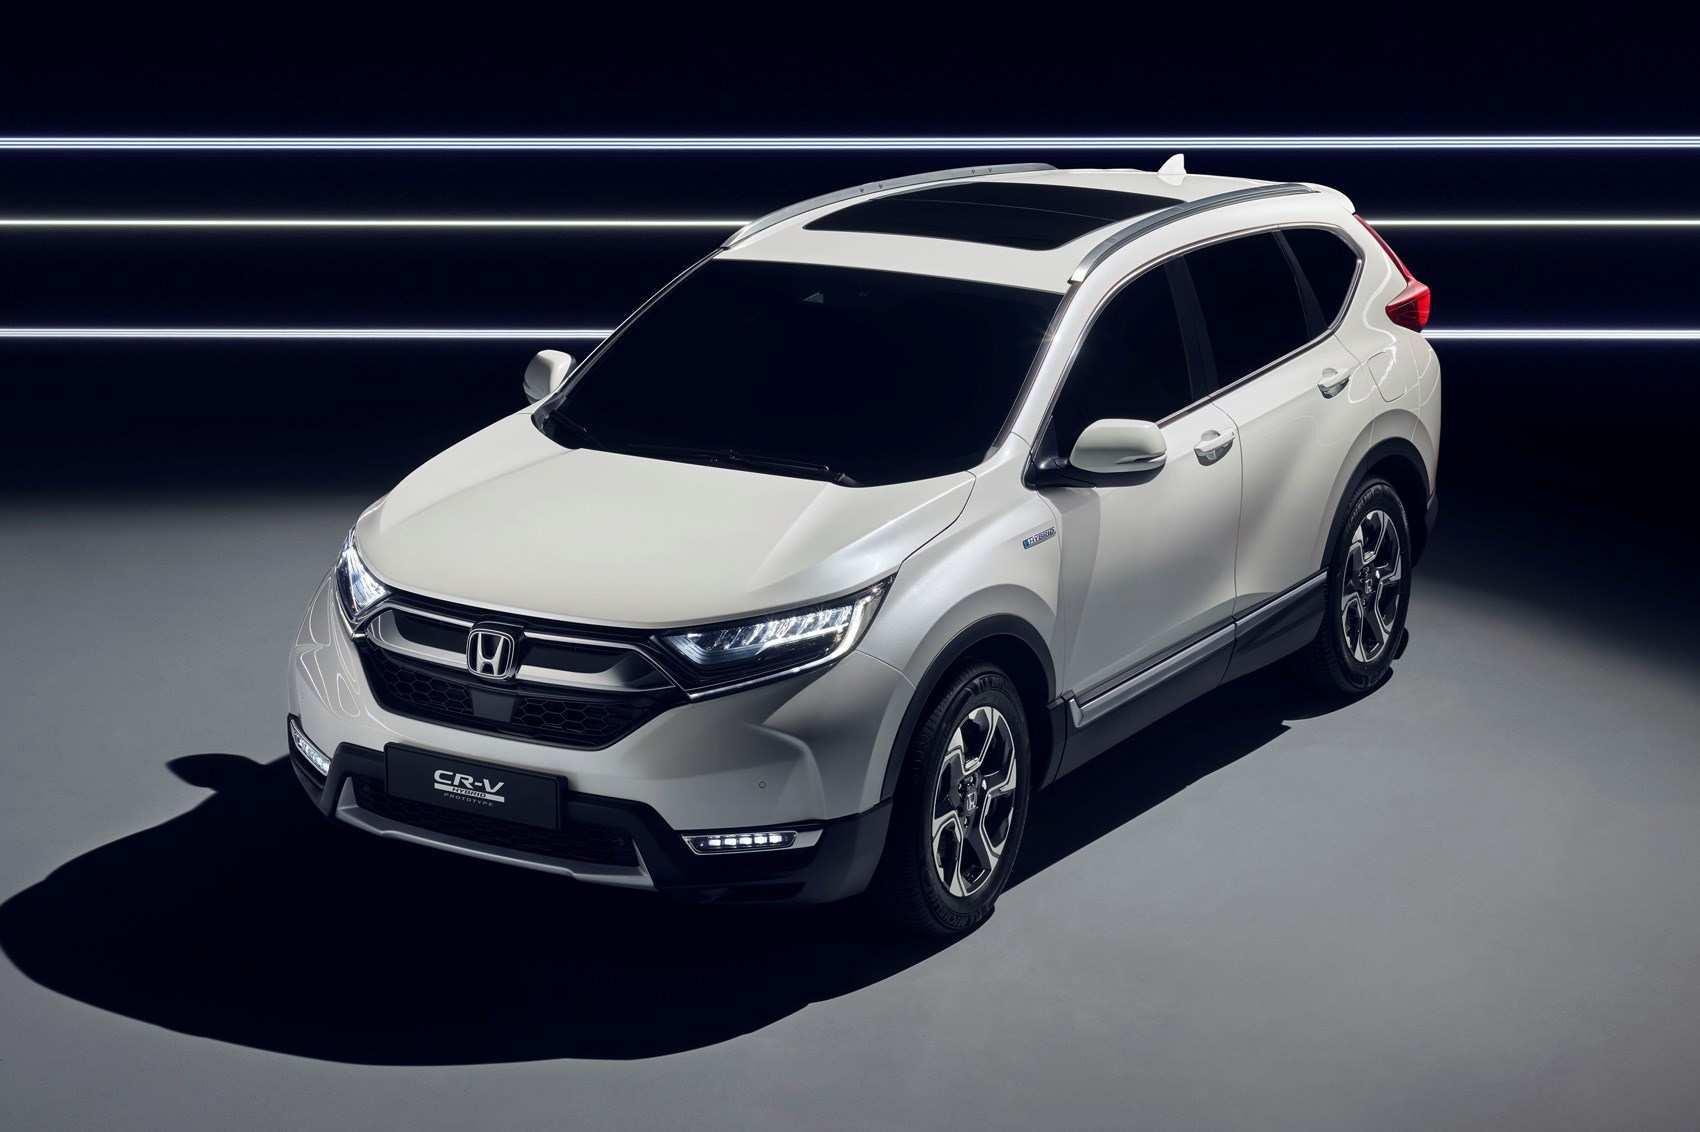 73 Concept of Honda Crv 2020 Ratings with Honda Crv 2020